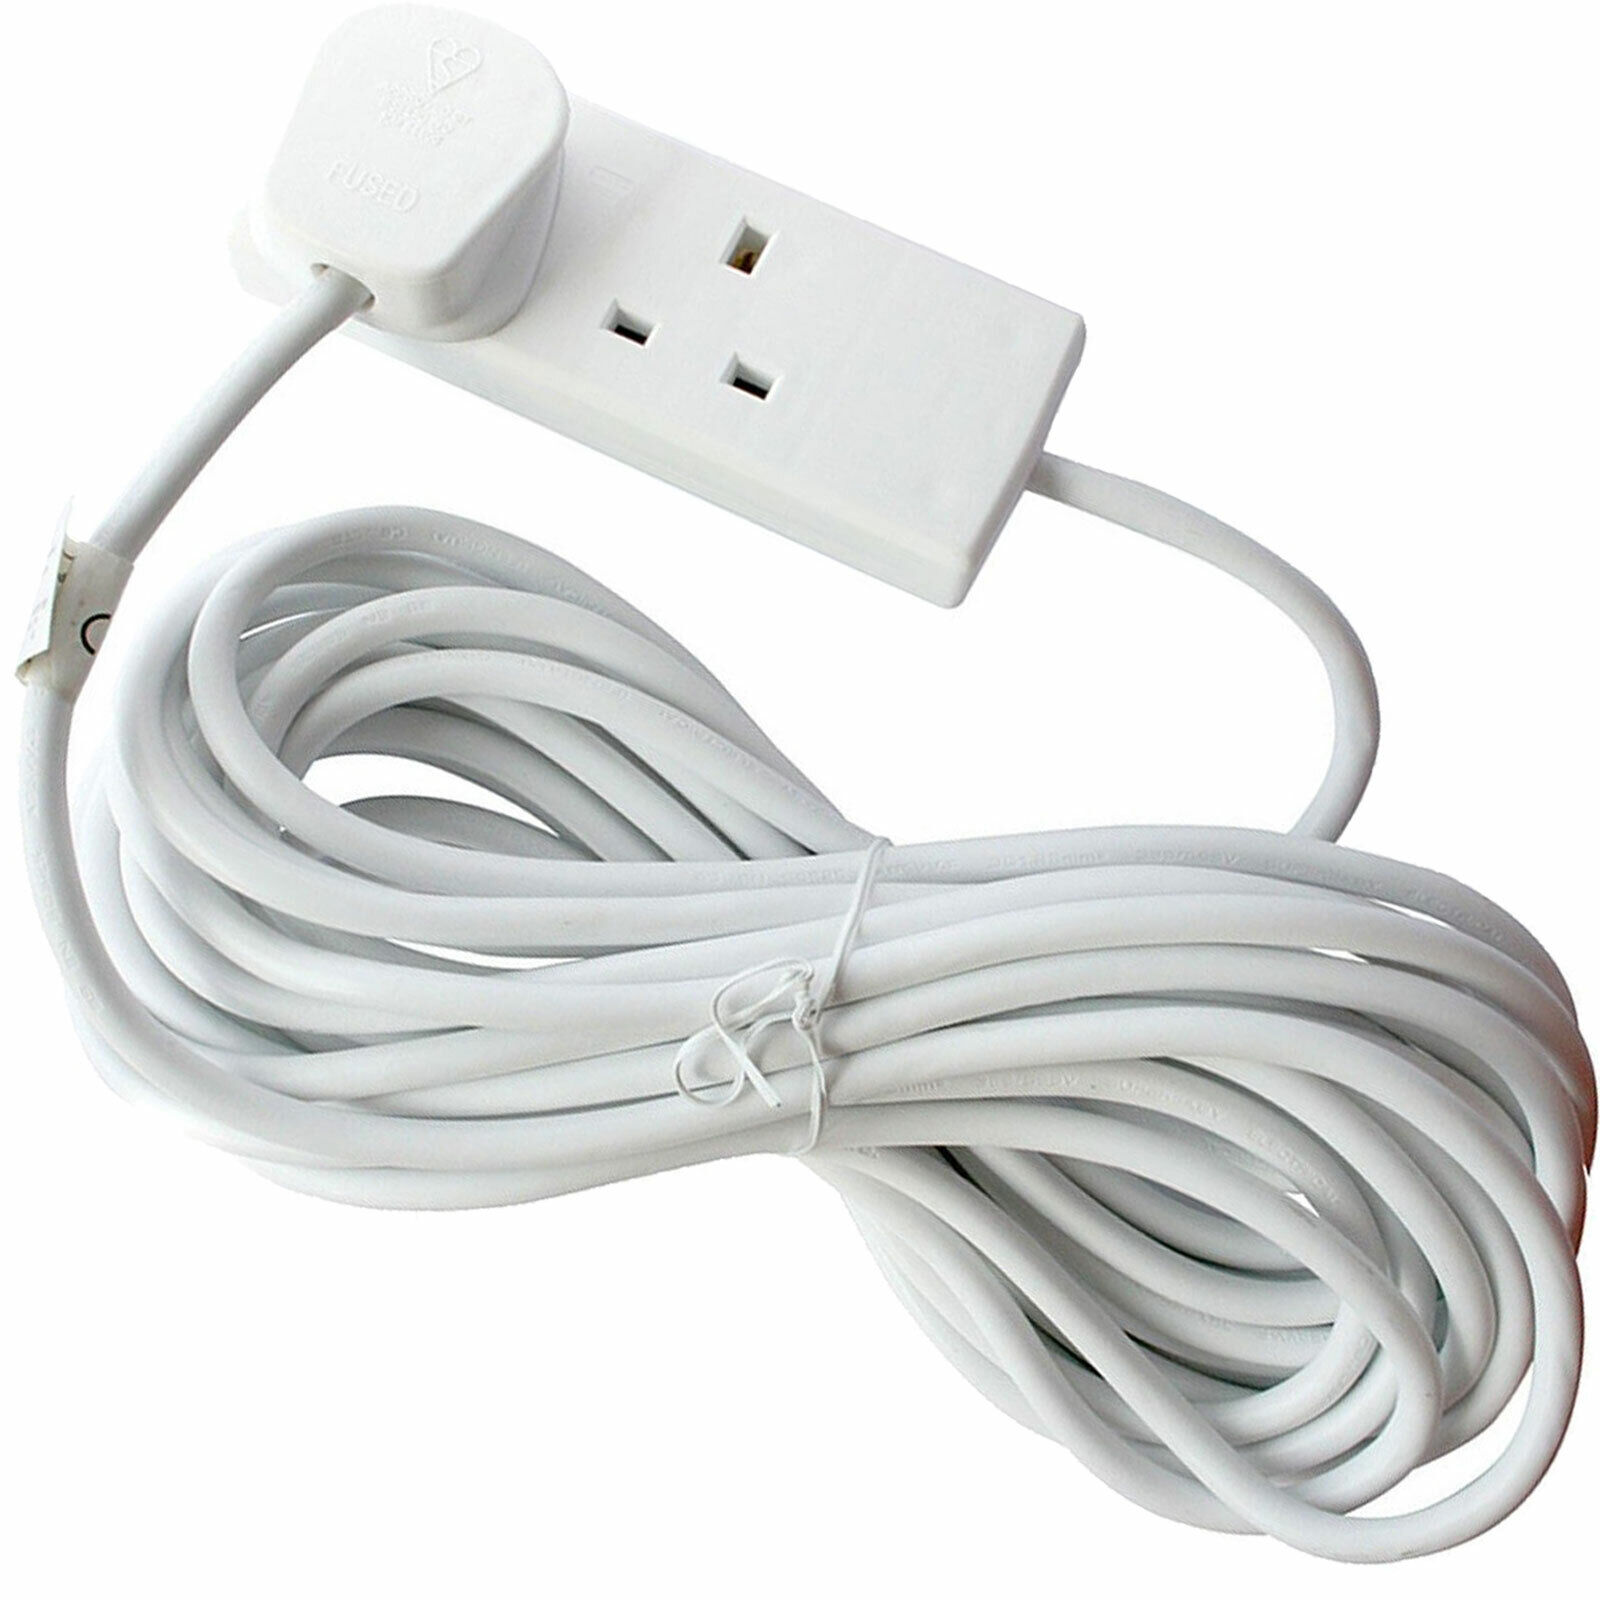 Invero 3 Way Triple Gang UK 3 Pin Multi-Socket Plug Extension Cable Free Mains Adaptor British Approved 13A Black